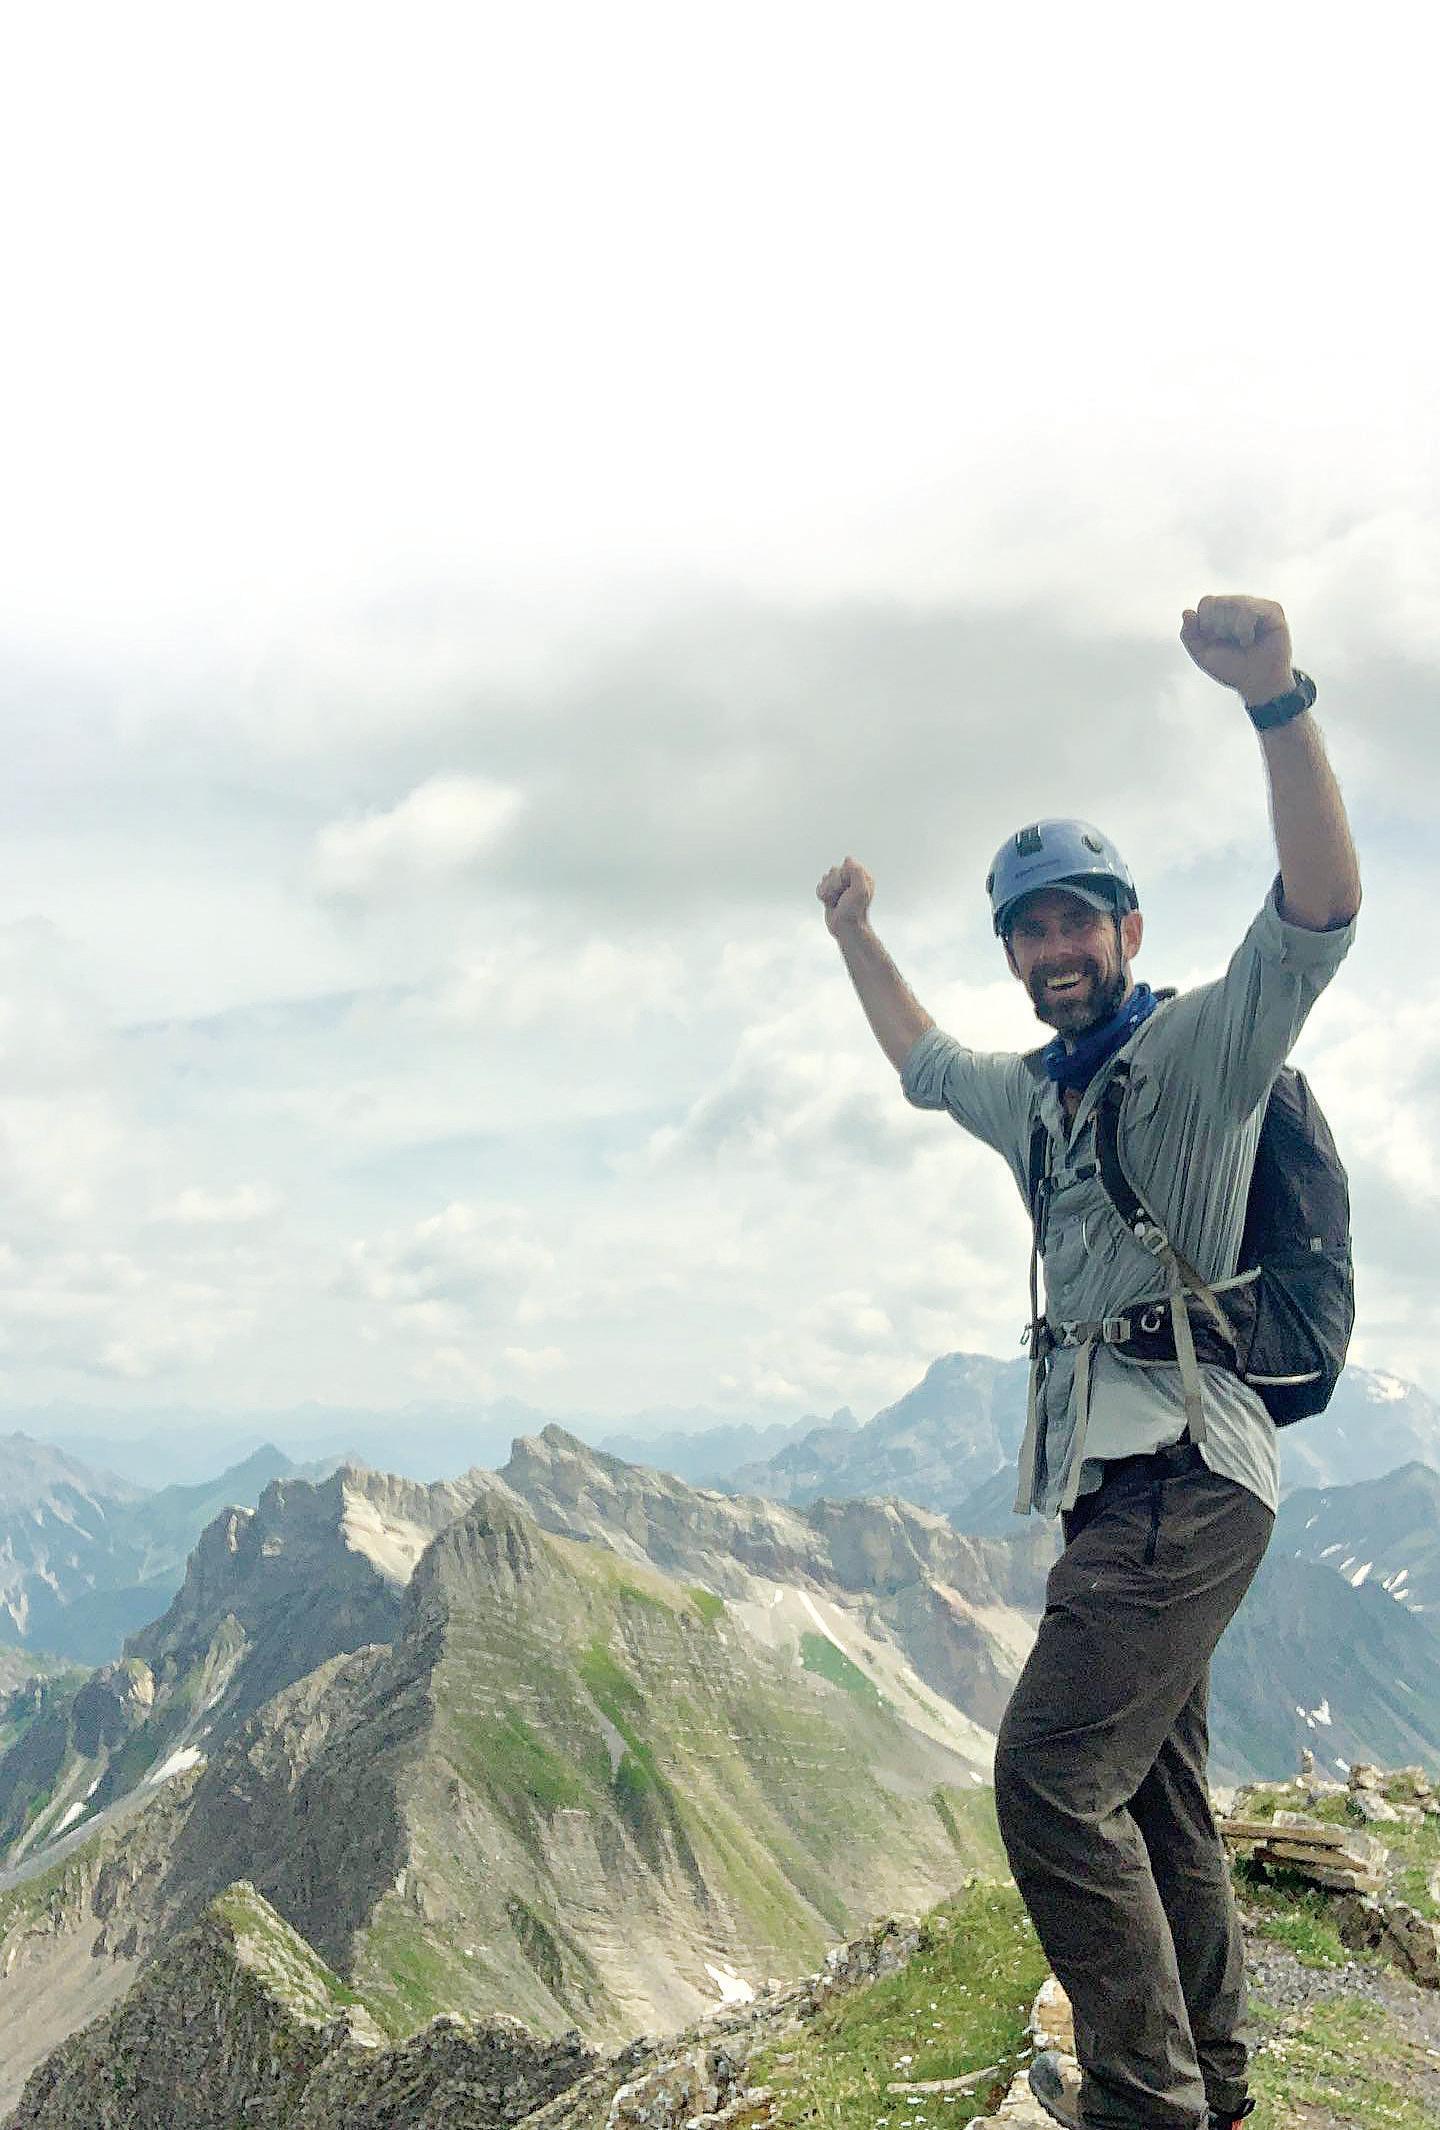 Ipswich climber Ricky Ellis climbed Vorder Grauspitz.